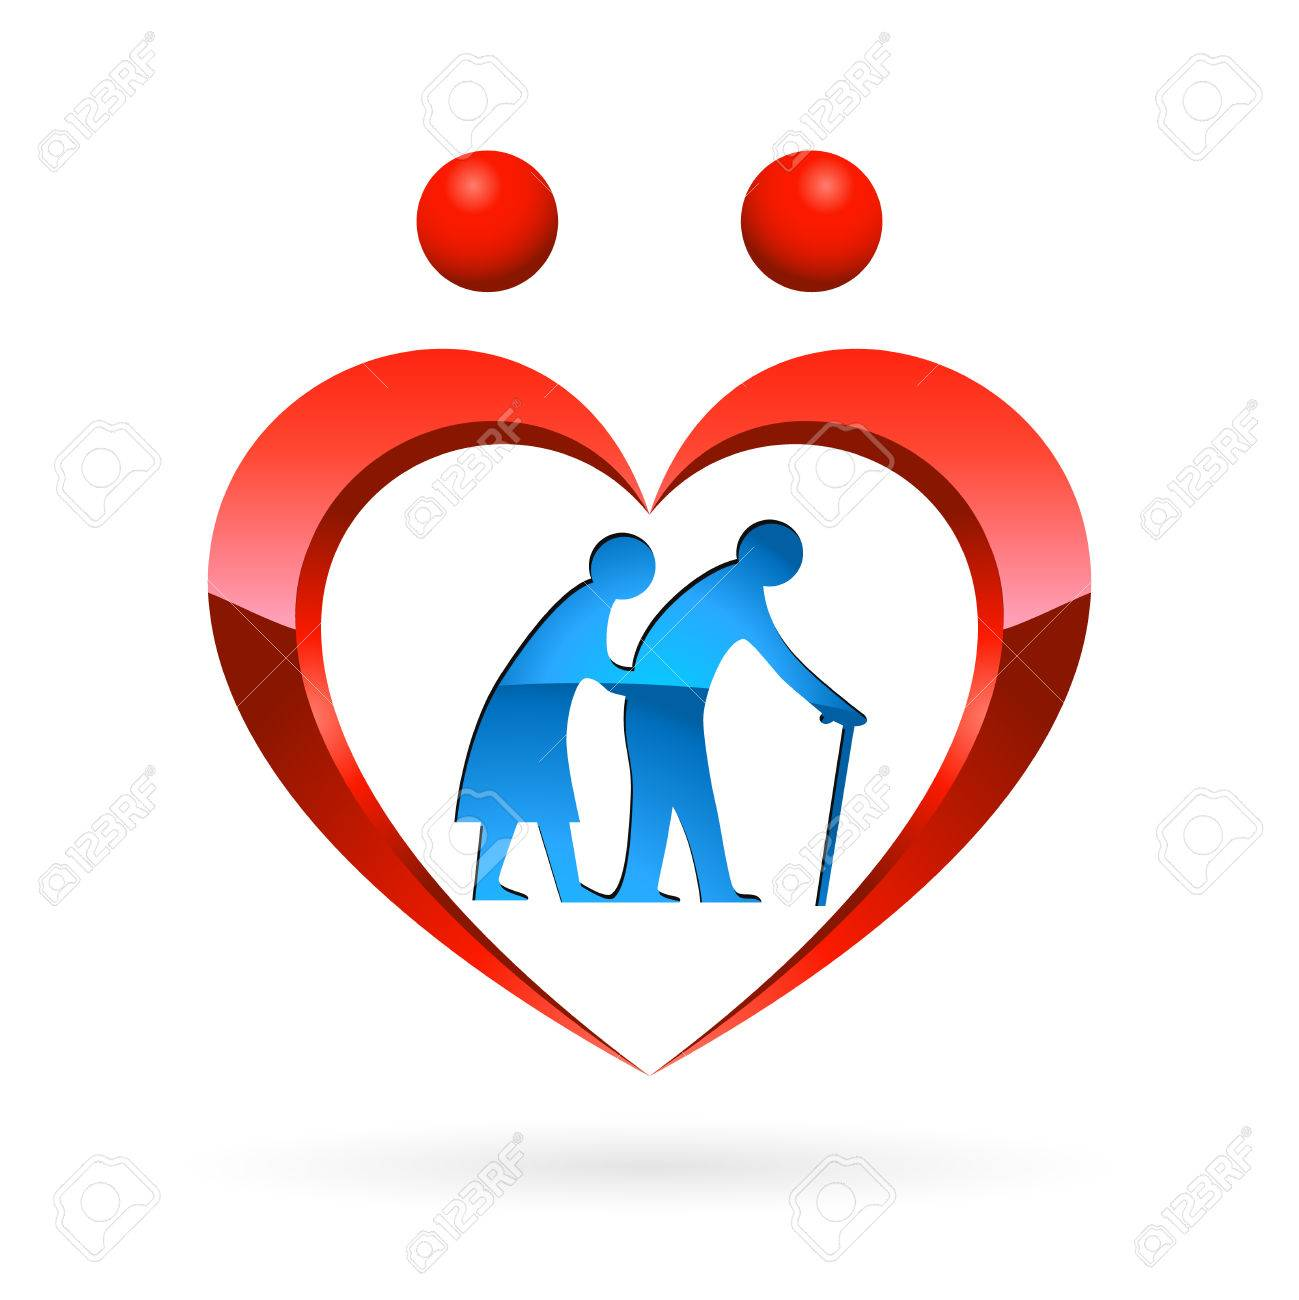 nursing home icon - vector illustration - 52879531